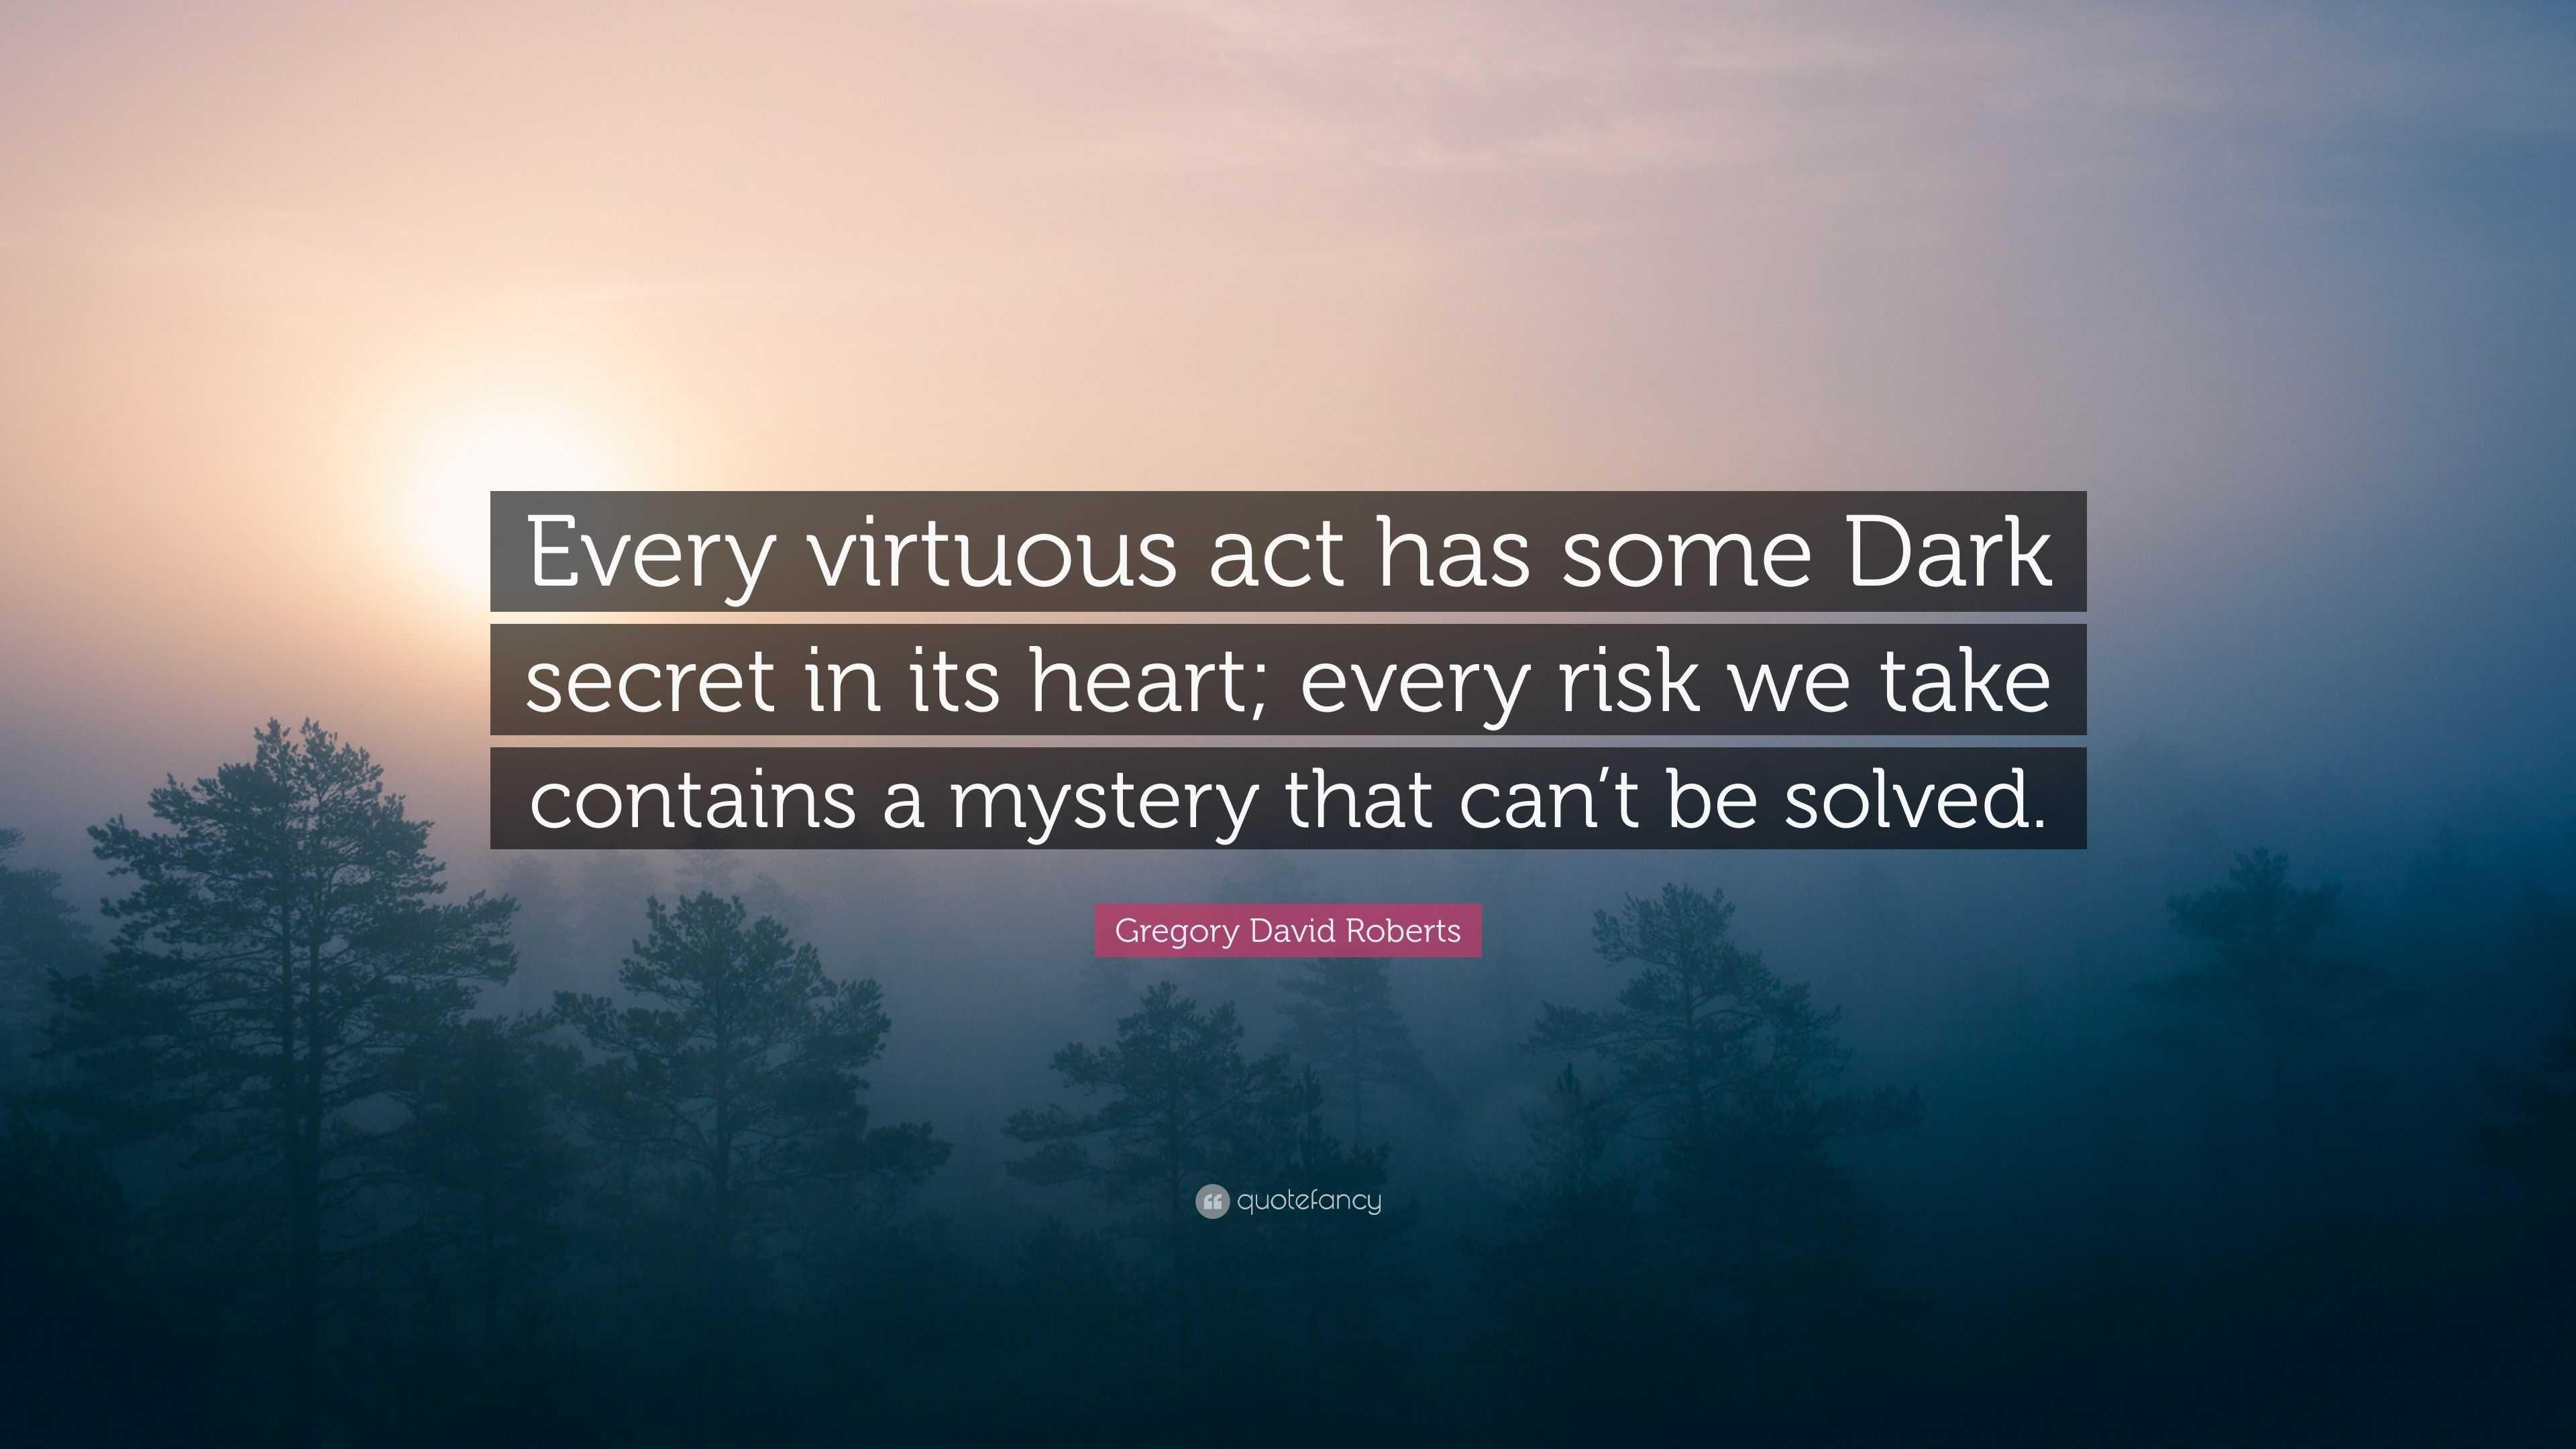 what are some dark secrets